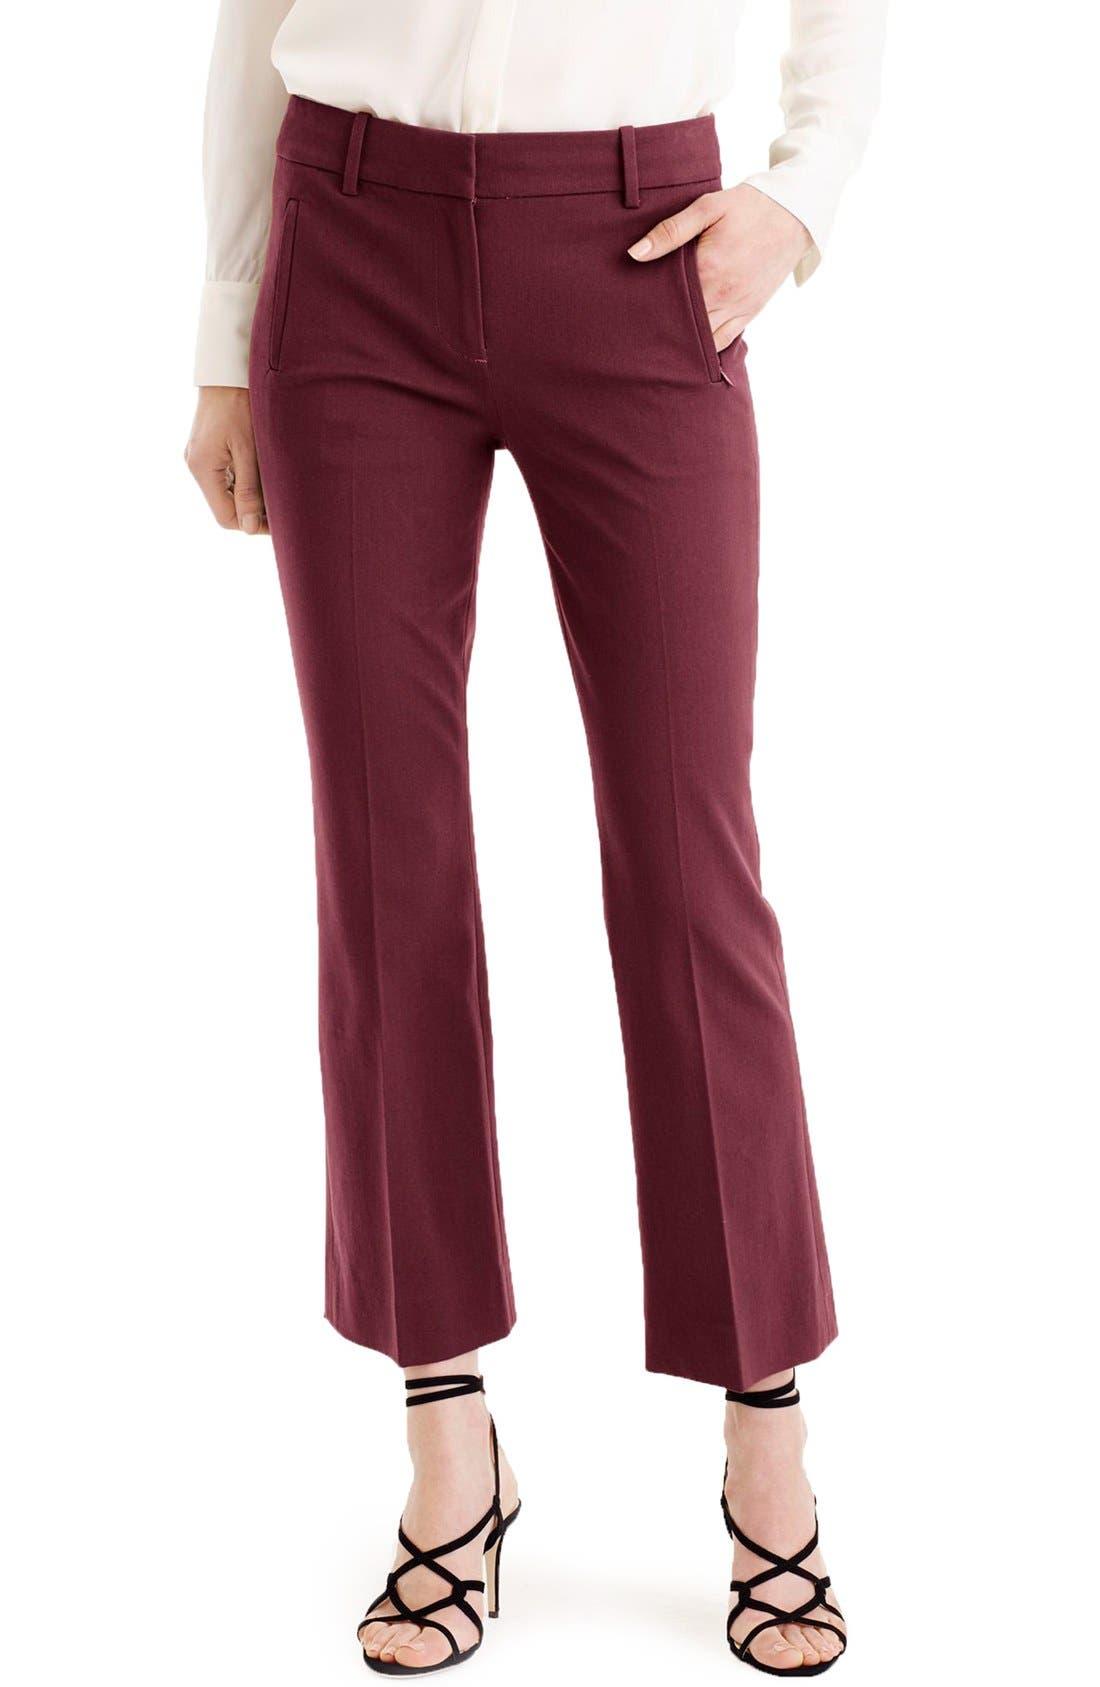 Alternate Image 1 Selected - J.Crew 'Teddie' Bi-Stretch Cotton Blend Pants (Regular & Petite)